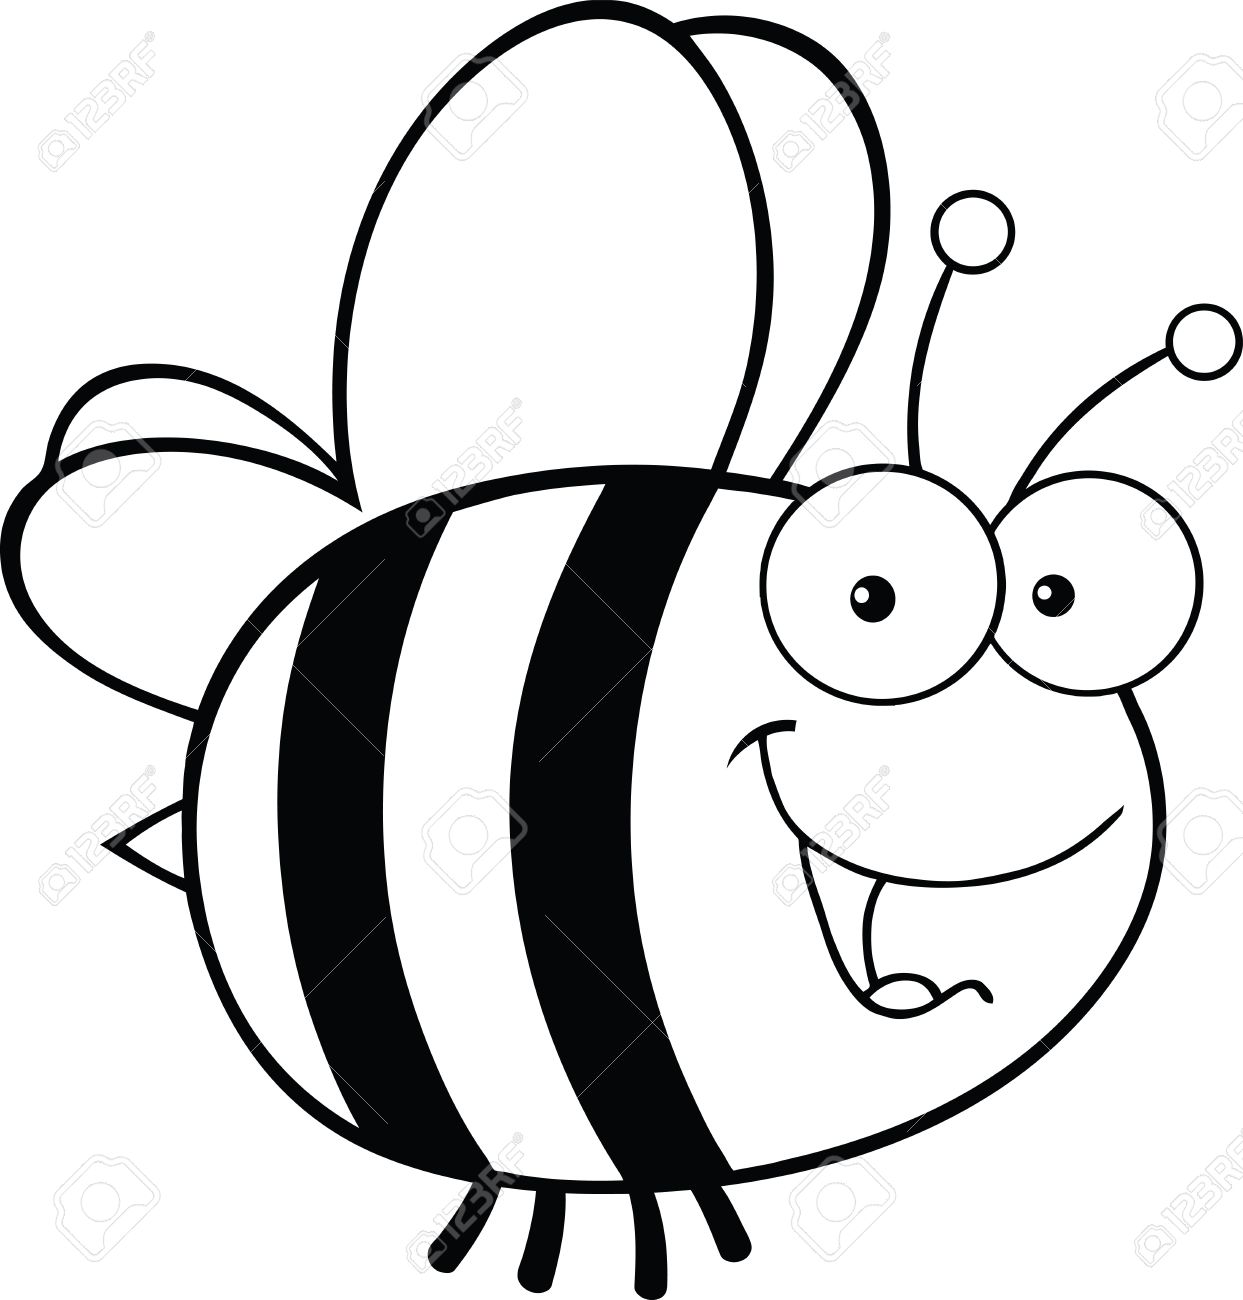 Black And White Bee Cartoon